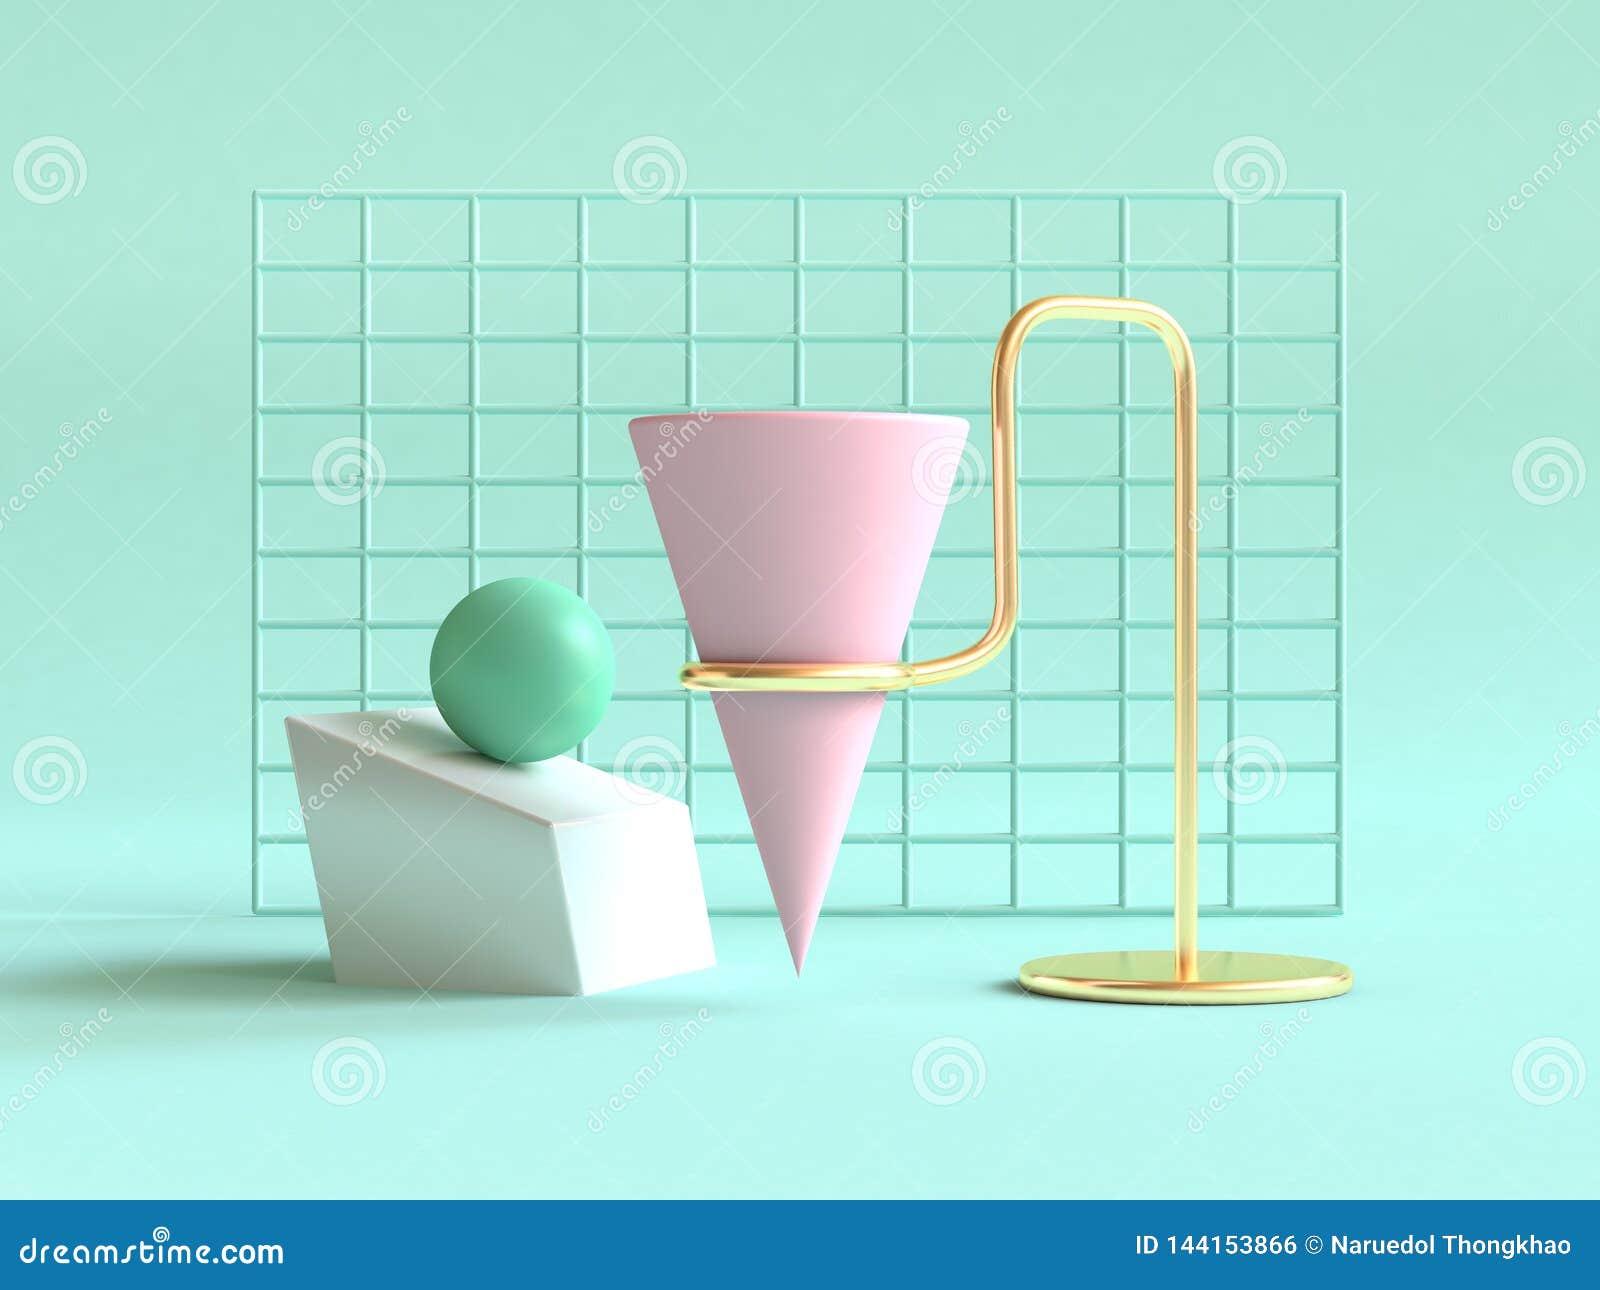 3d maak groene achtergrond geometrische vorm abstracte stillevenscène roze groen goud